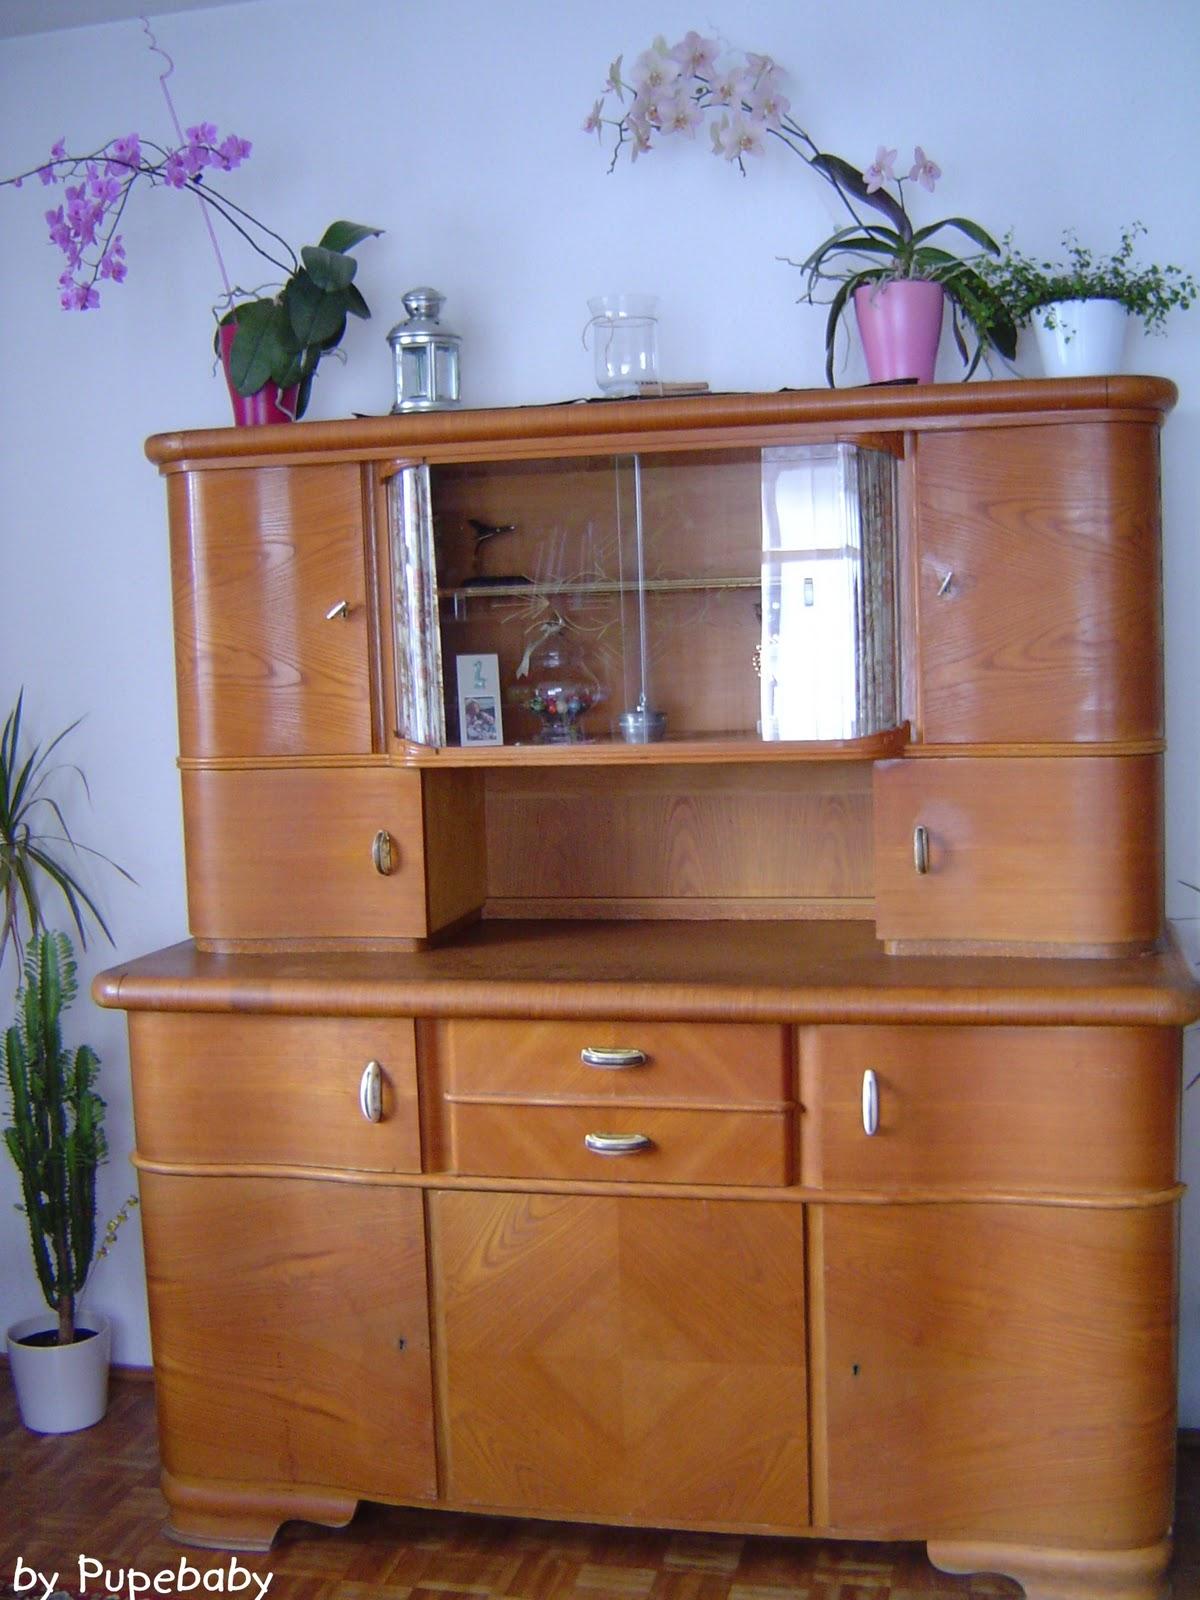 pupe s fadenkreuz aufpoliert. Black Bedroom Furniture Sets. Home Design Ideas